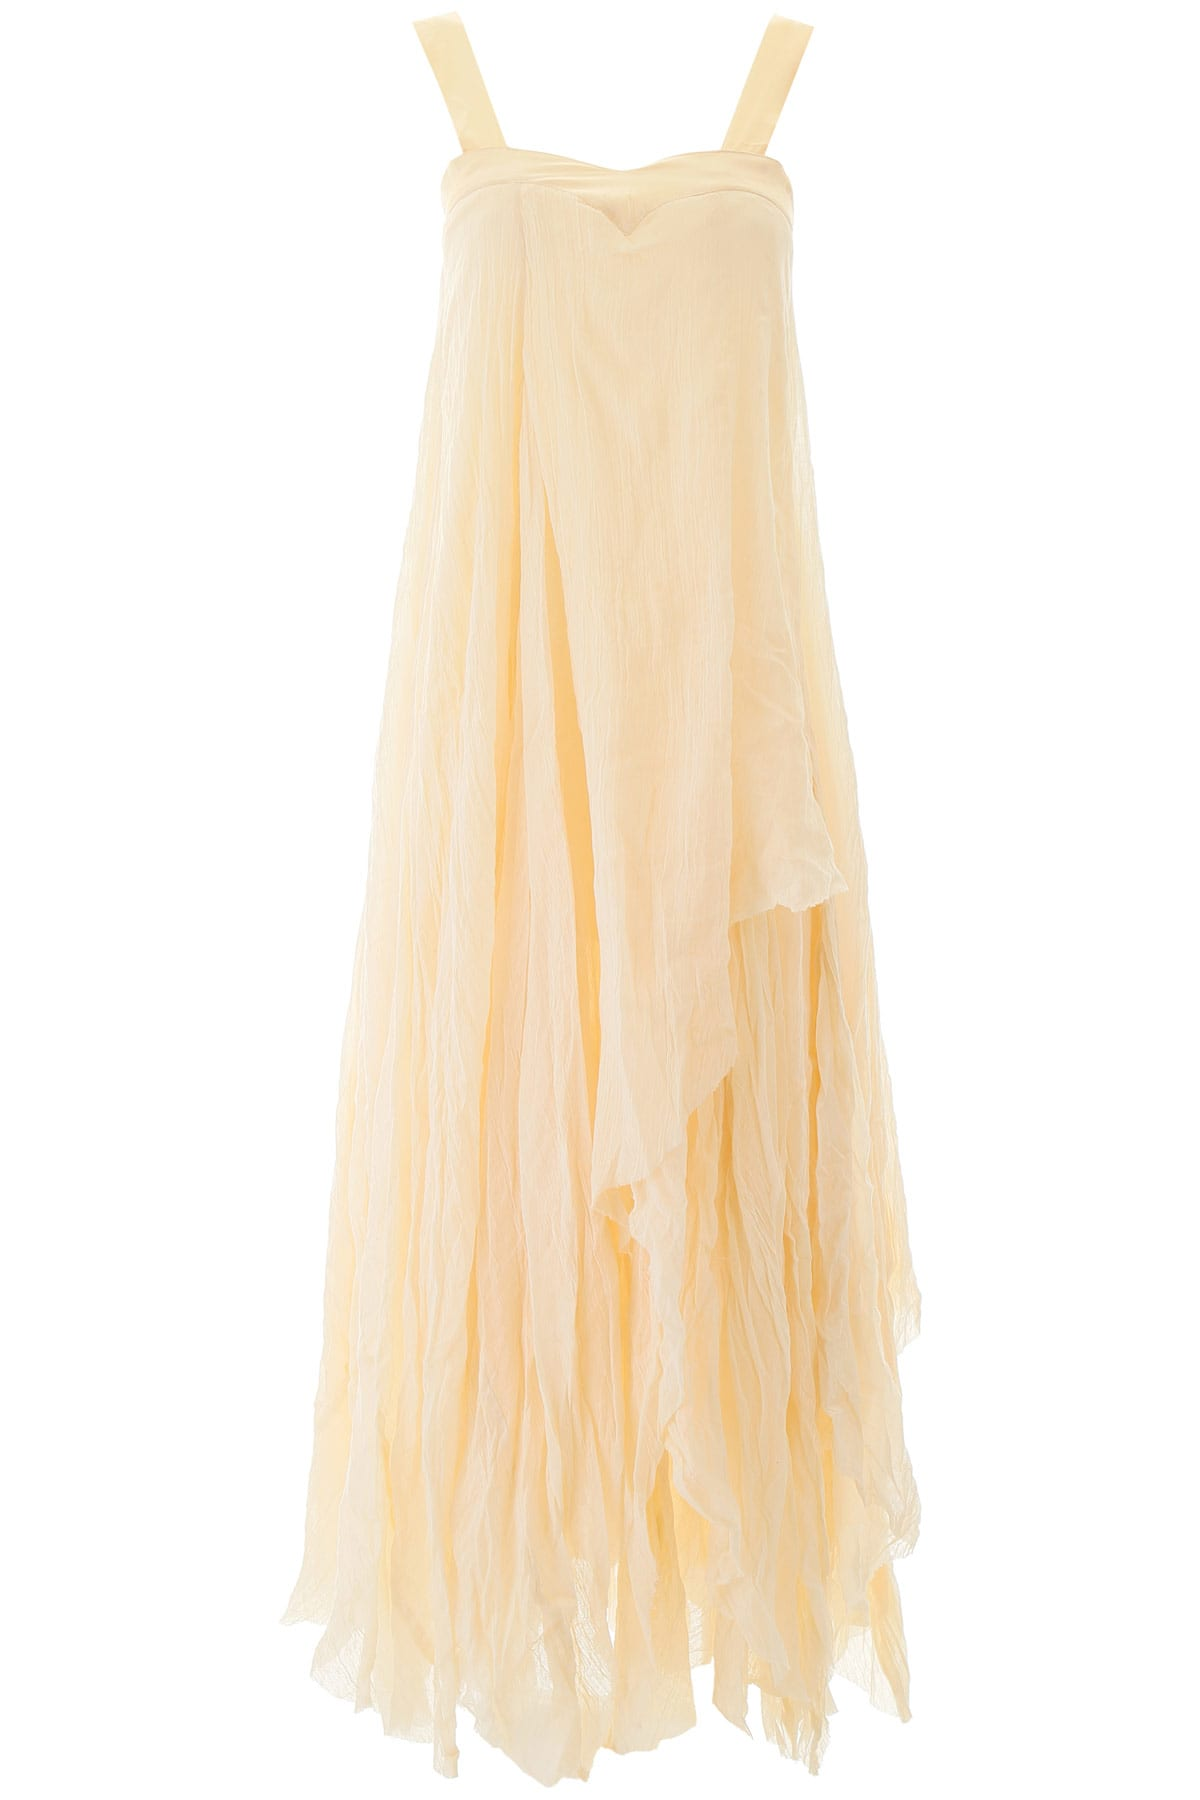 Mes Demoiselles Valentine Asymmetrical Dress